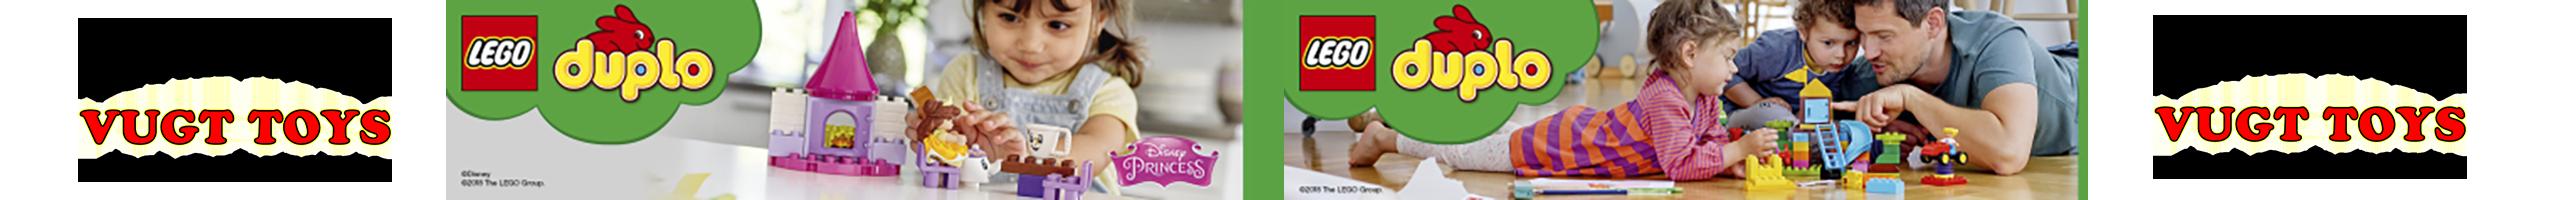 LEGO Shop Vugt Toys Vlijmen